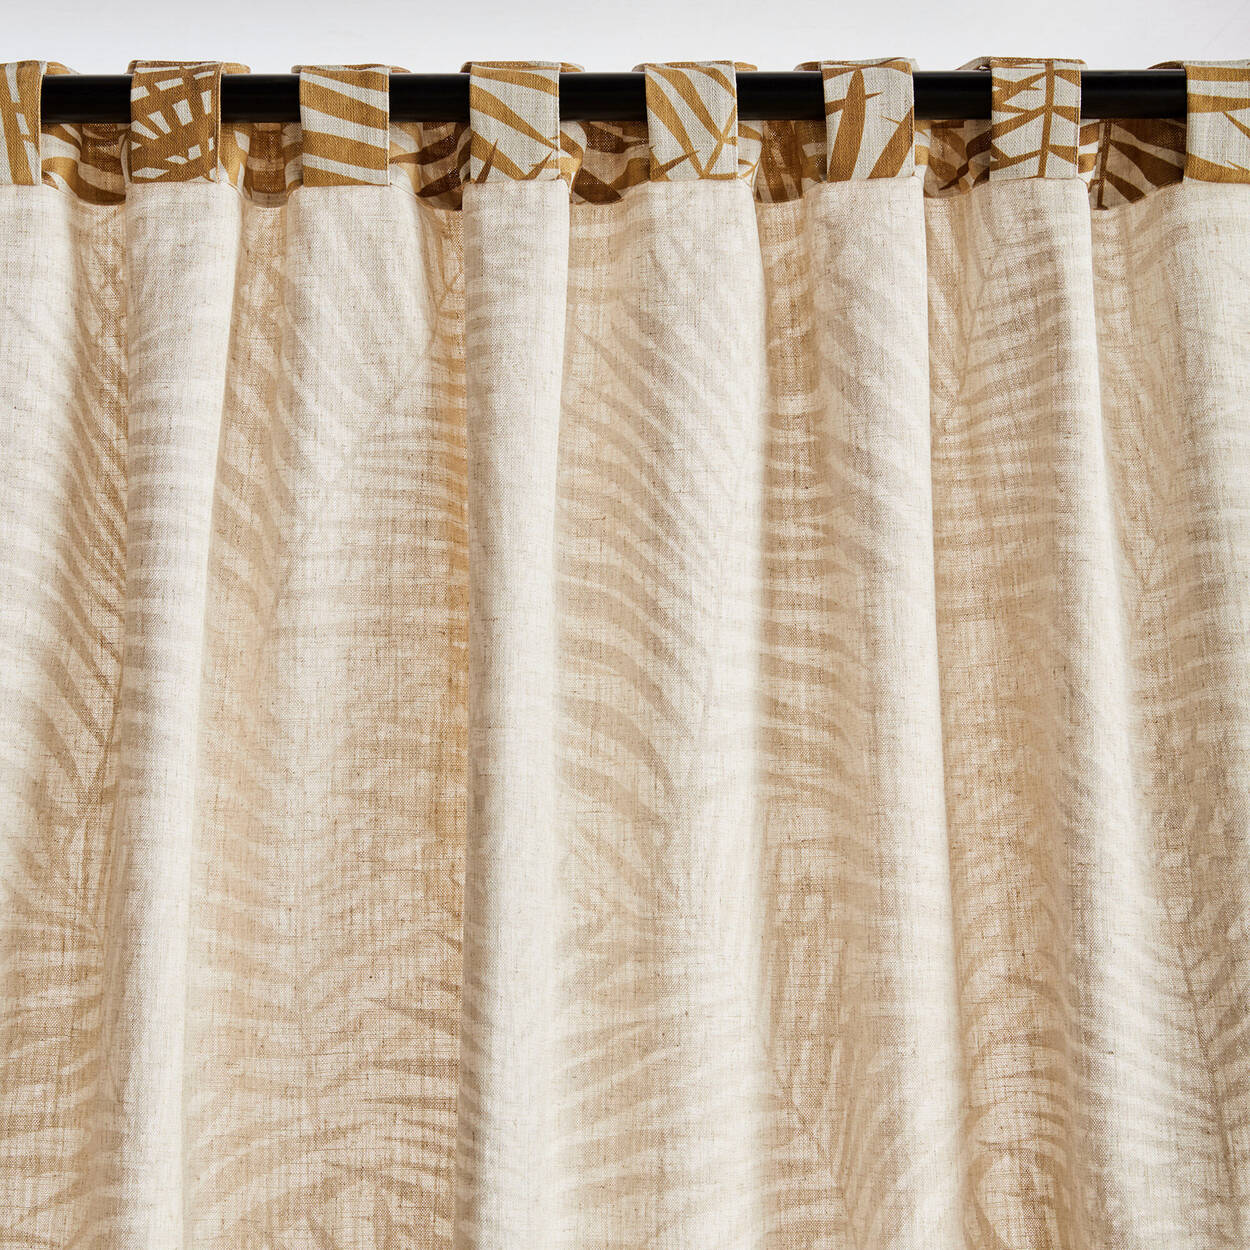 Nicole Ochre Foliage Curtain